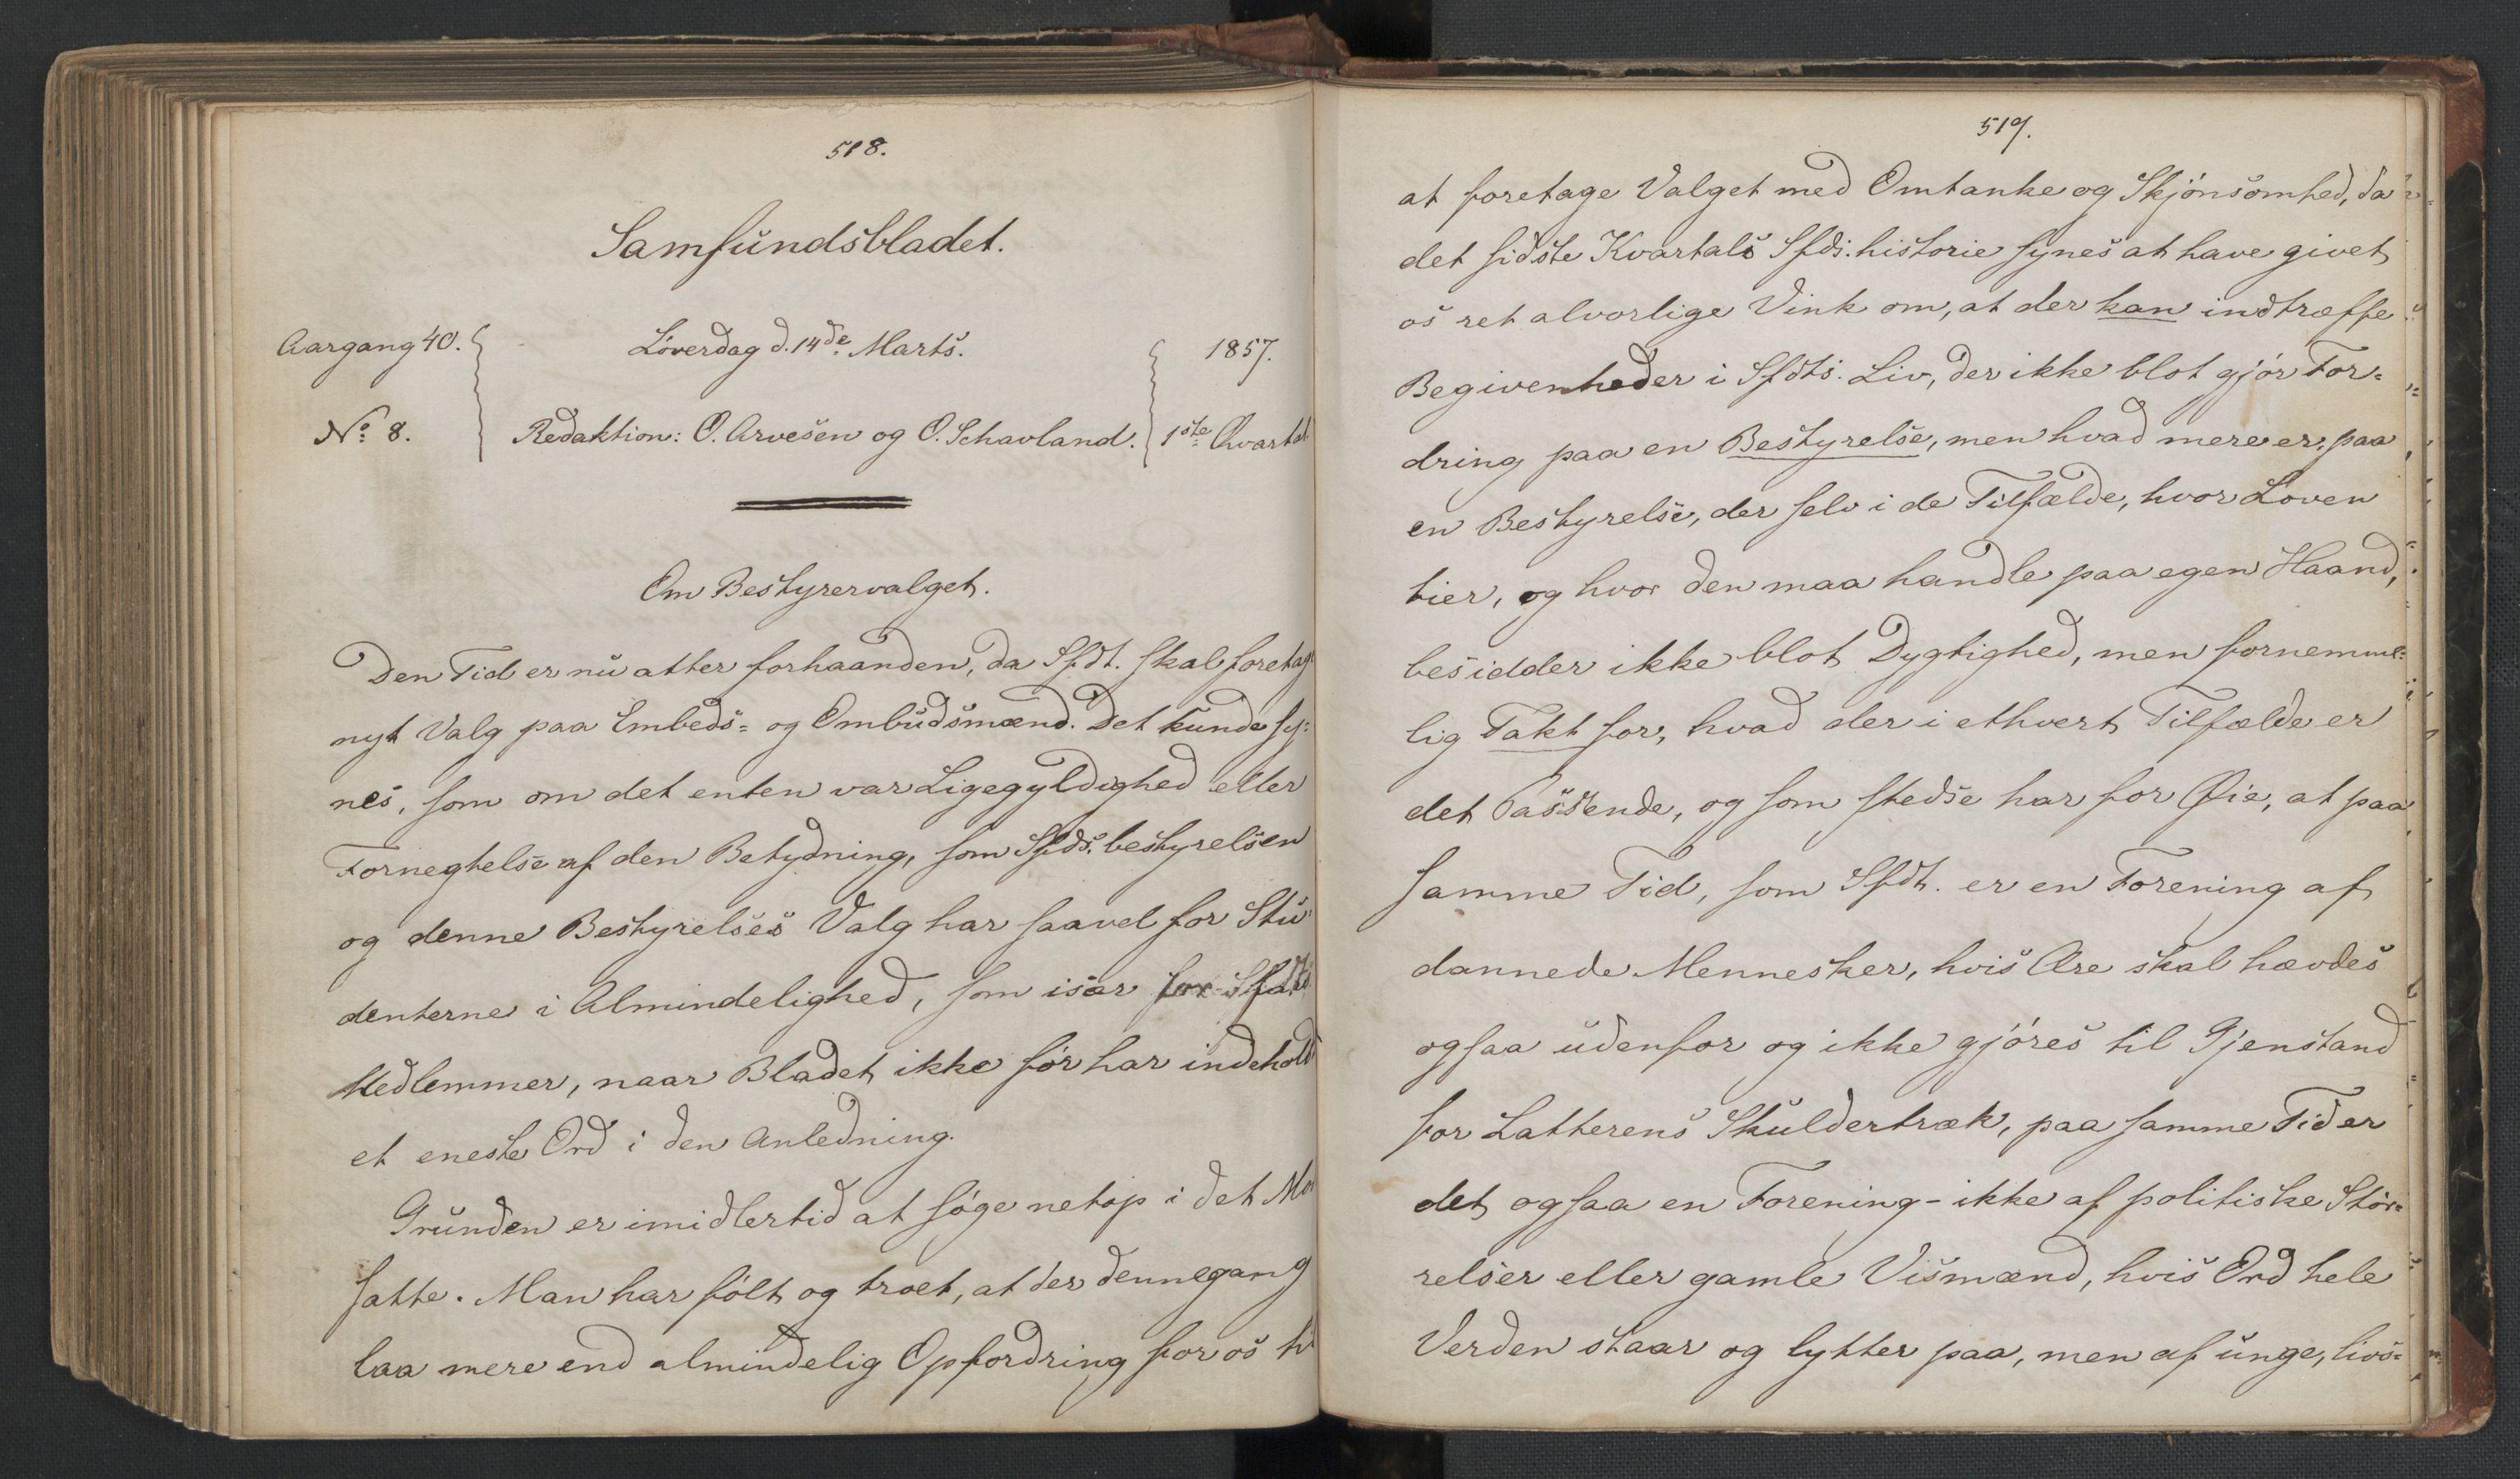 RA, Det Norske Studentersamfund, X/Xa/L0006, 1856-1857, s. 263